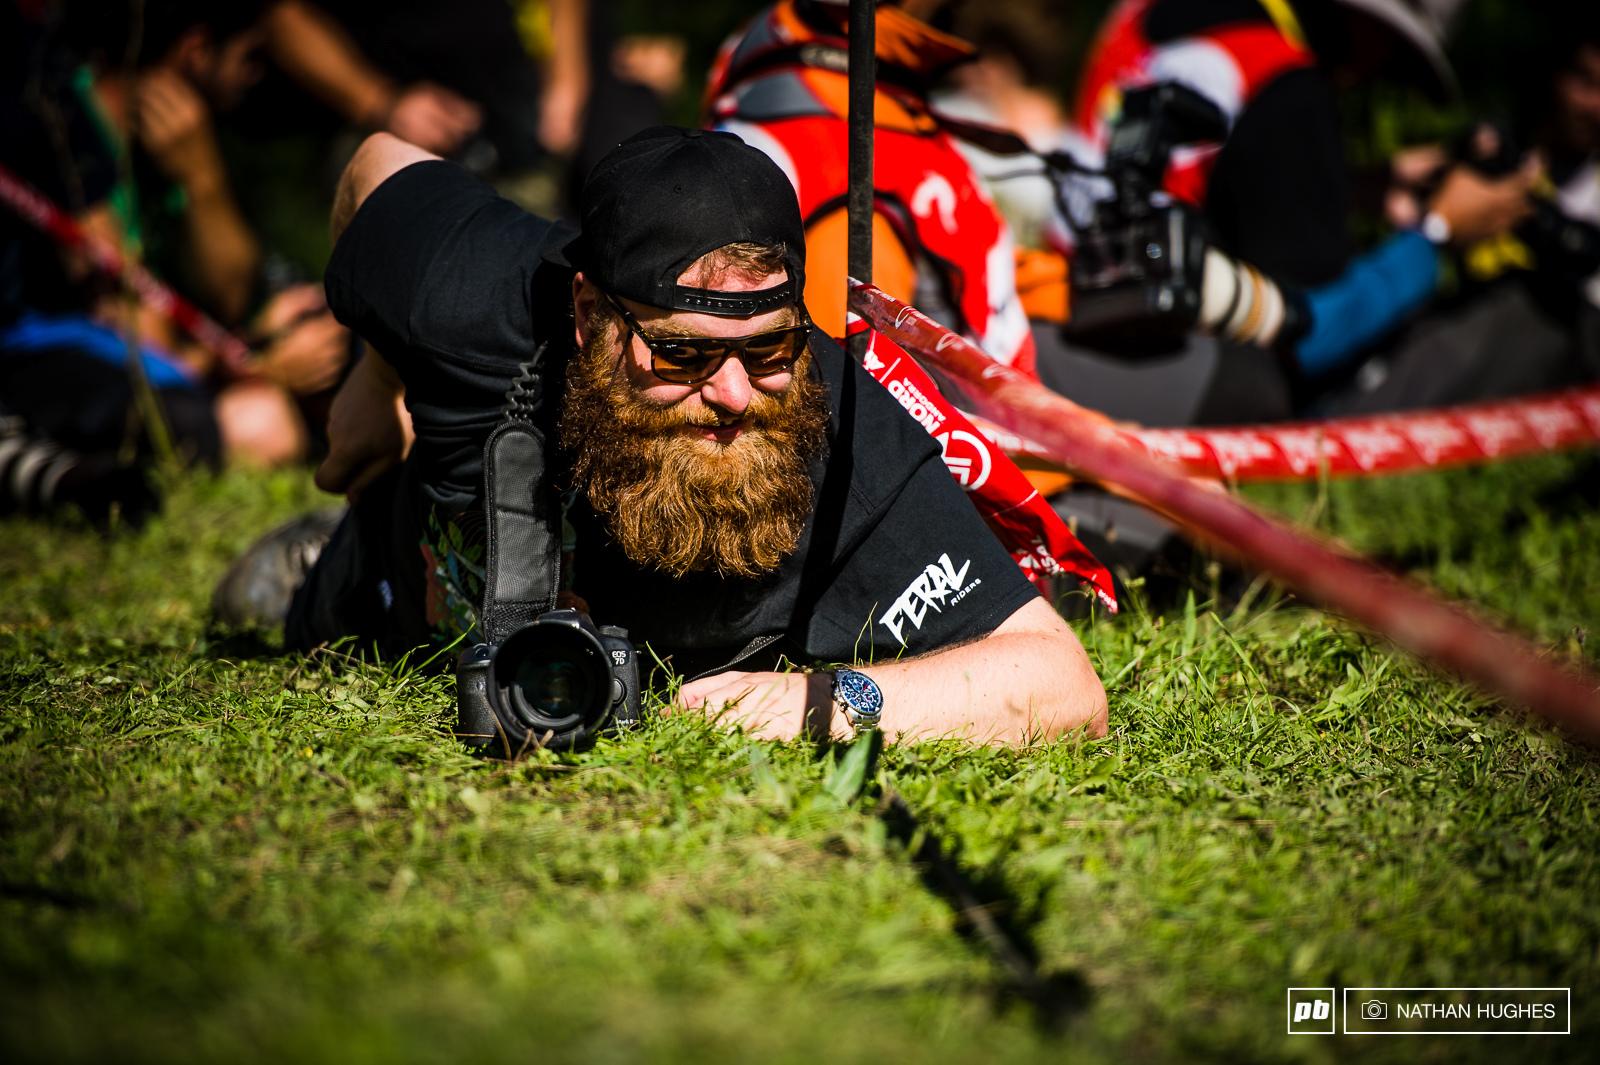 Bearded sniper on the grassy knoll.